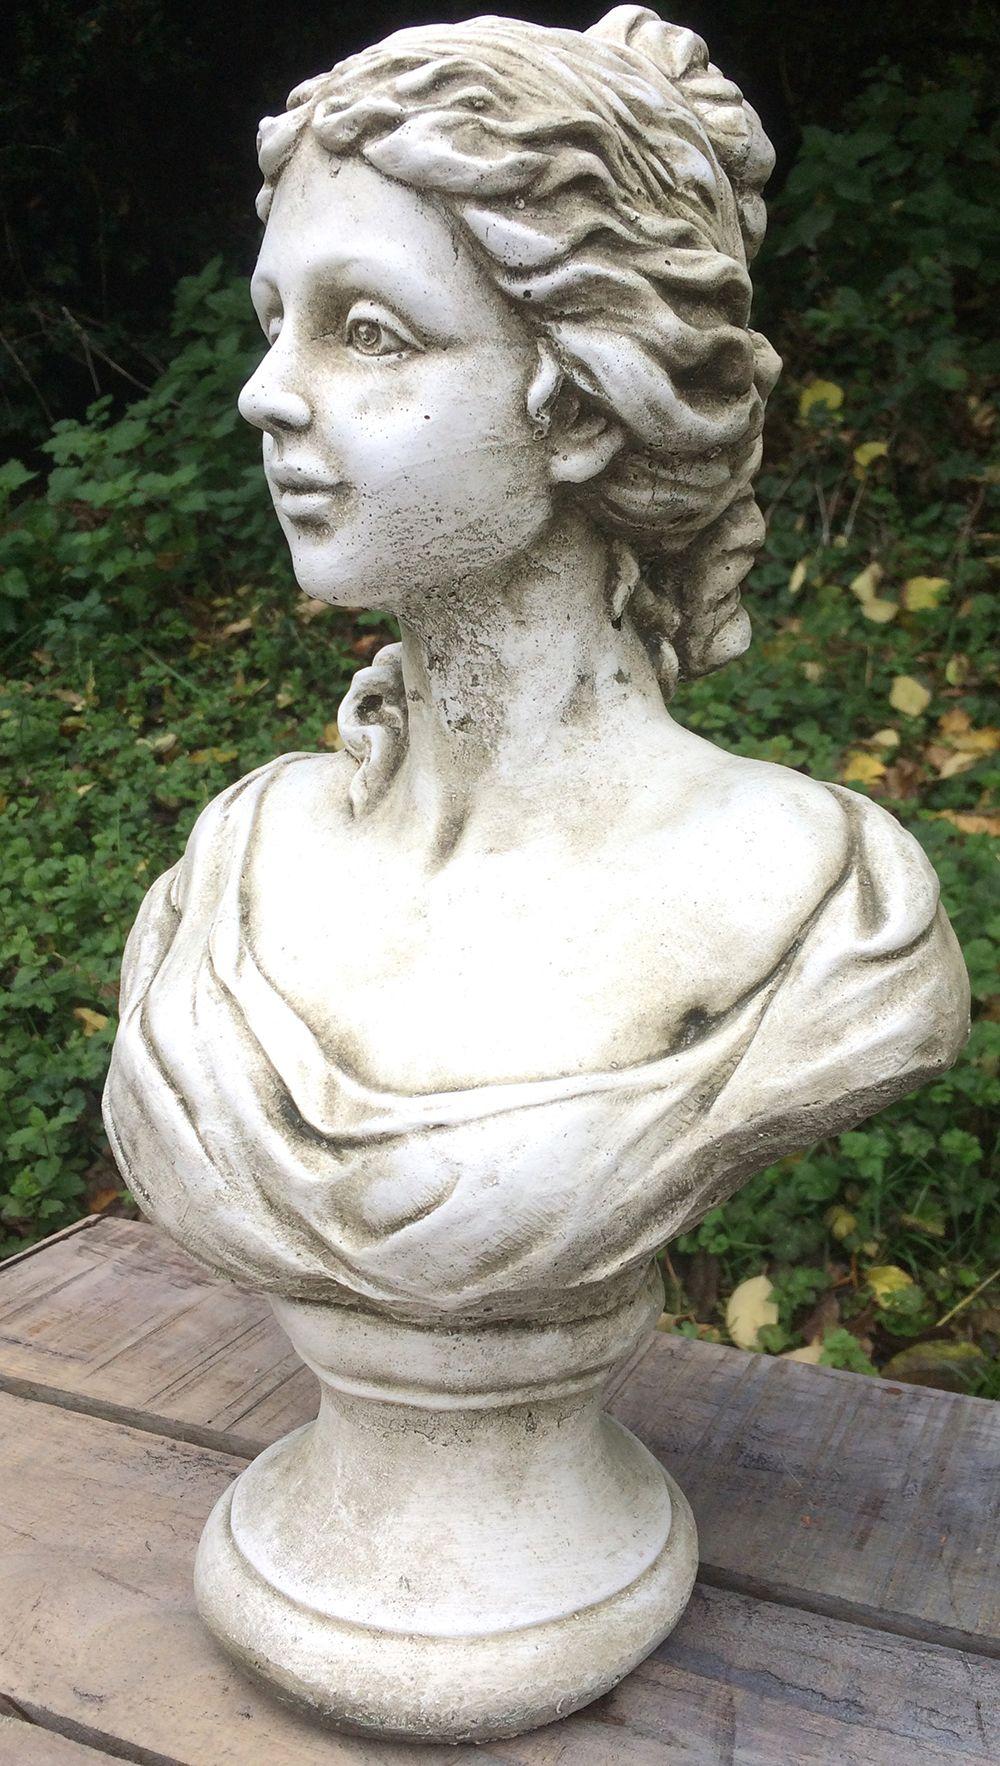 Female Bust Statue Marie Stone Garden Ornament